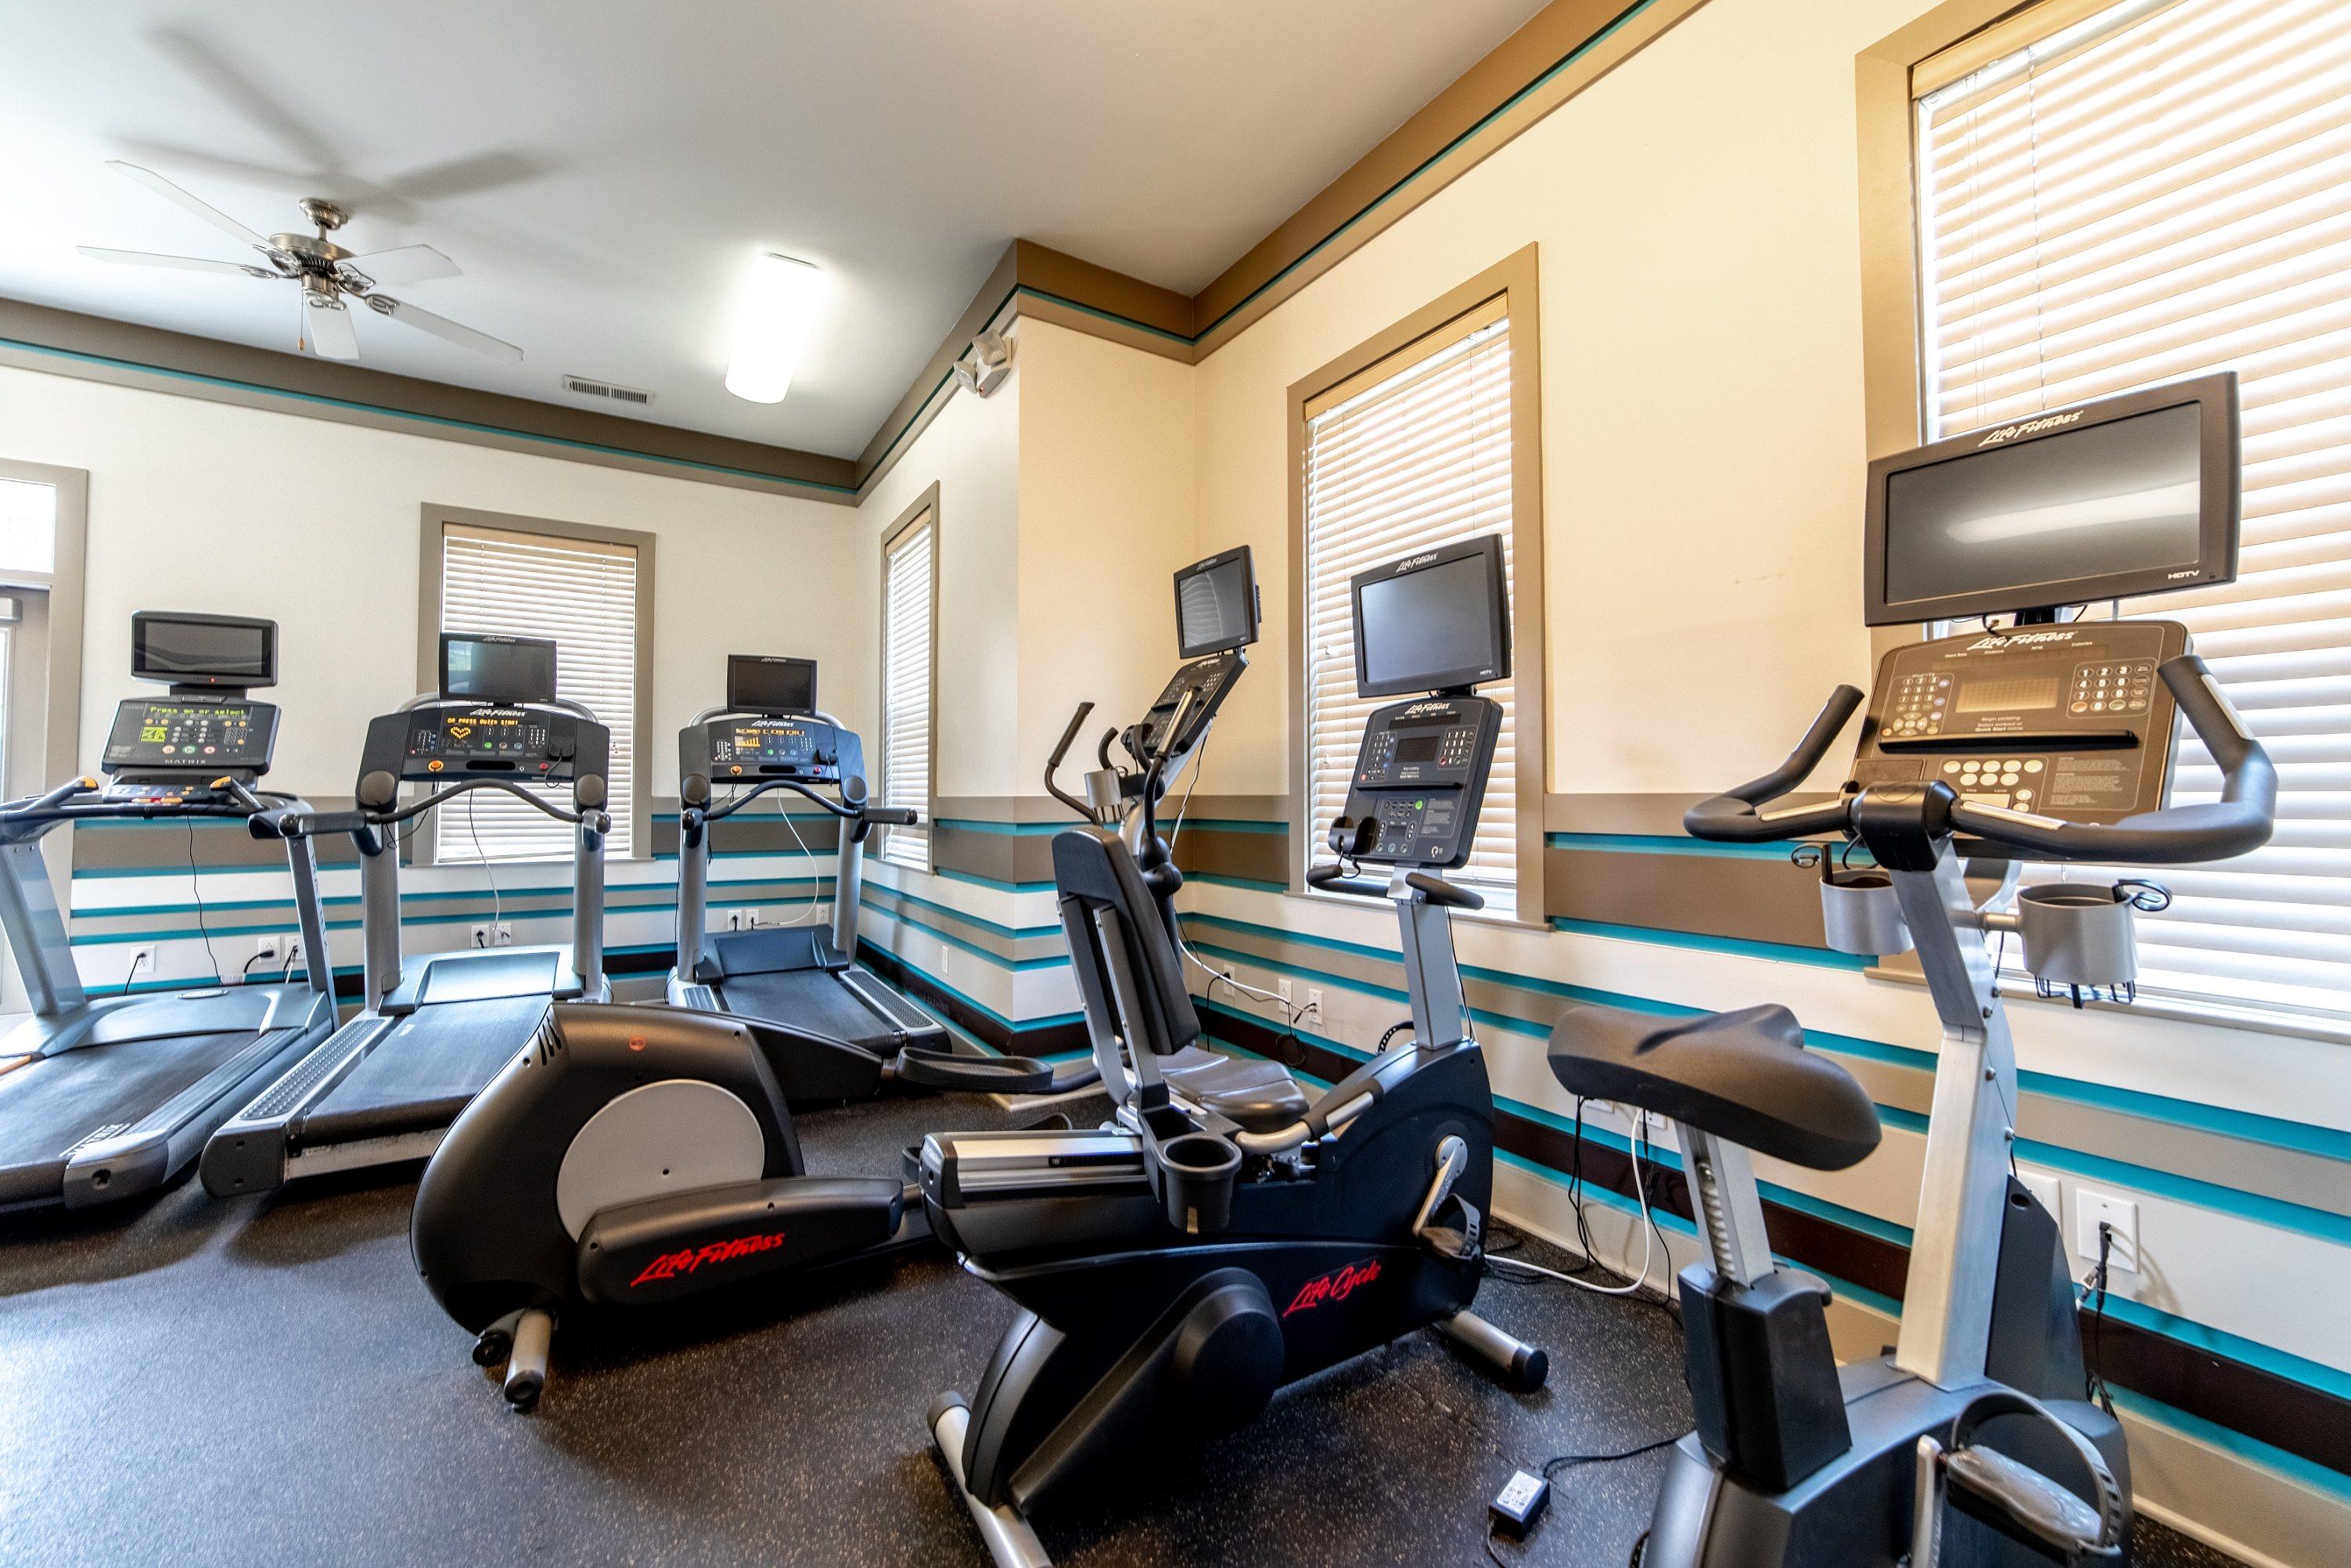 Cardio Machines In Gym at Buckingham Monon Living, Indianapolis, IN, 46220